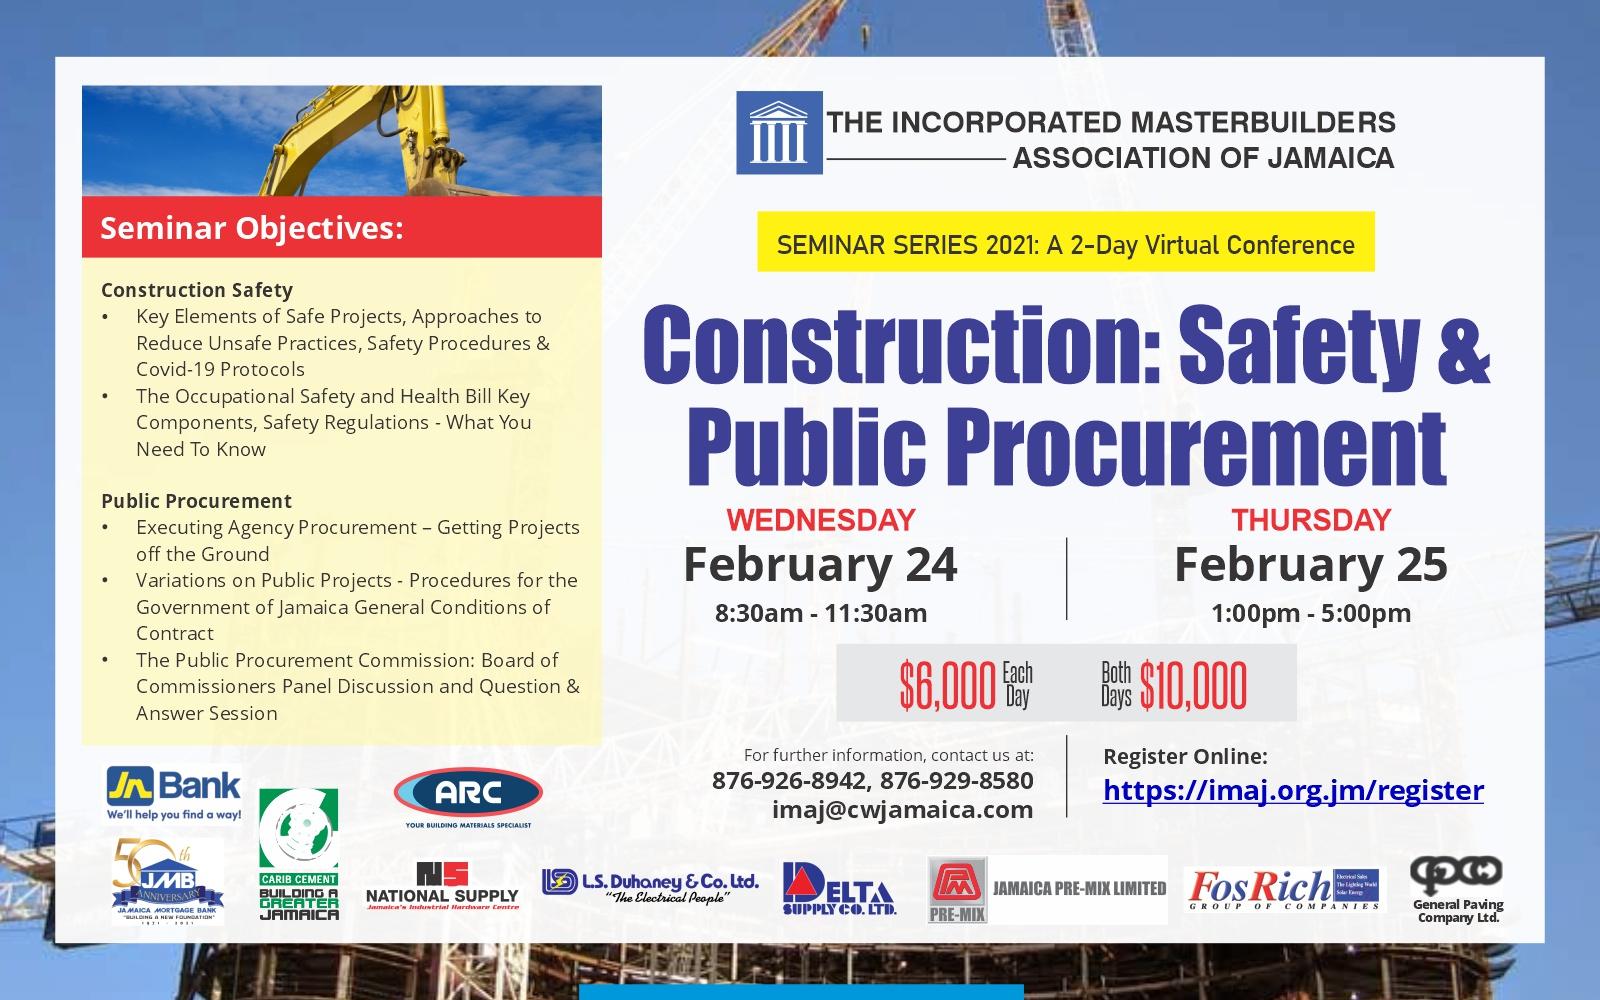 IMAJ Seminar Series 2021- Construction: Safety & Public Procurement